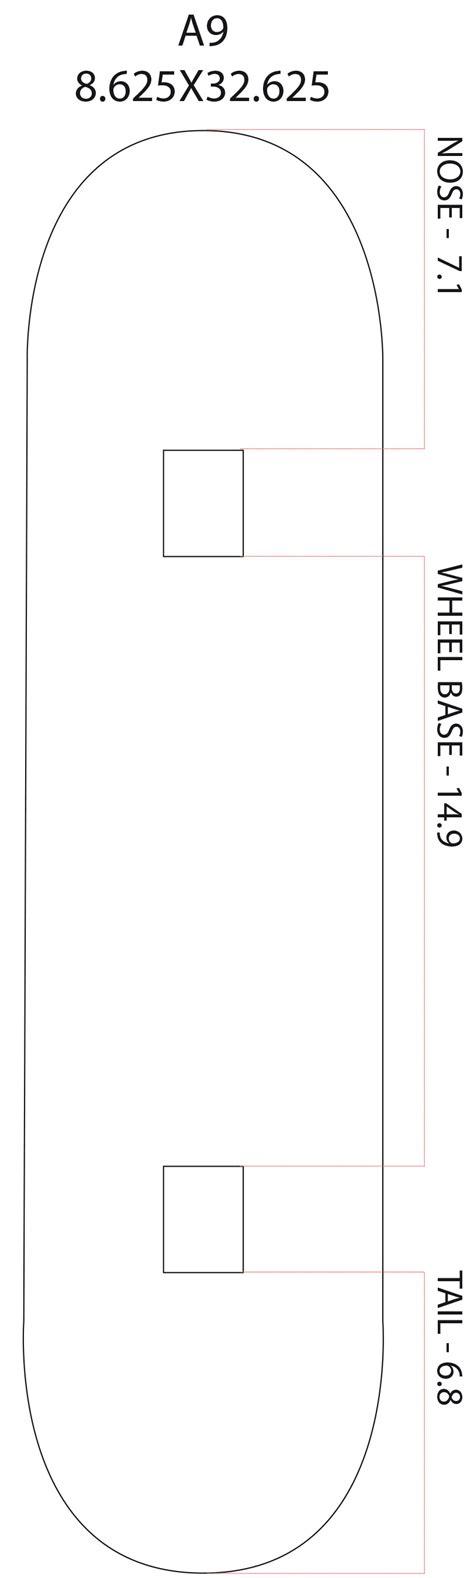 Tshirt A9 Best Product skateboard shape with artprint manufacturer